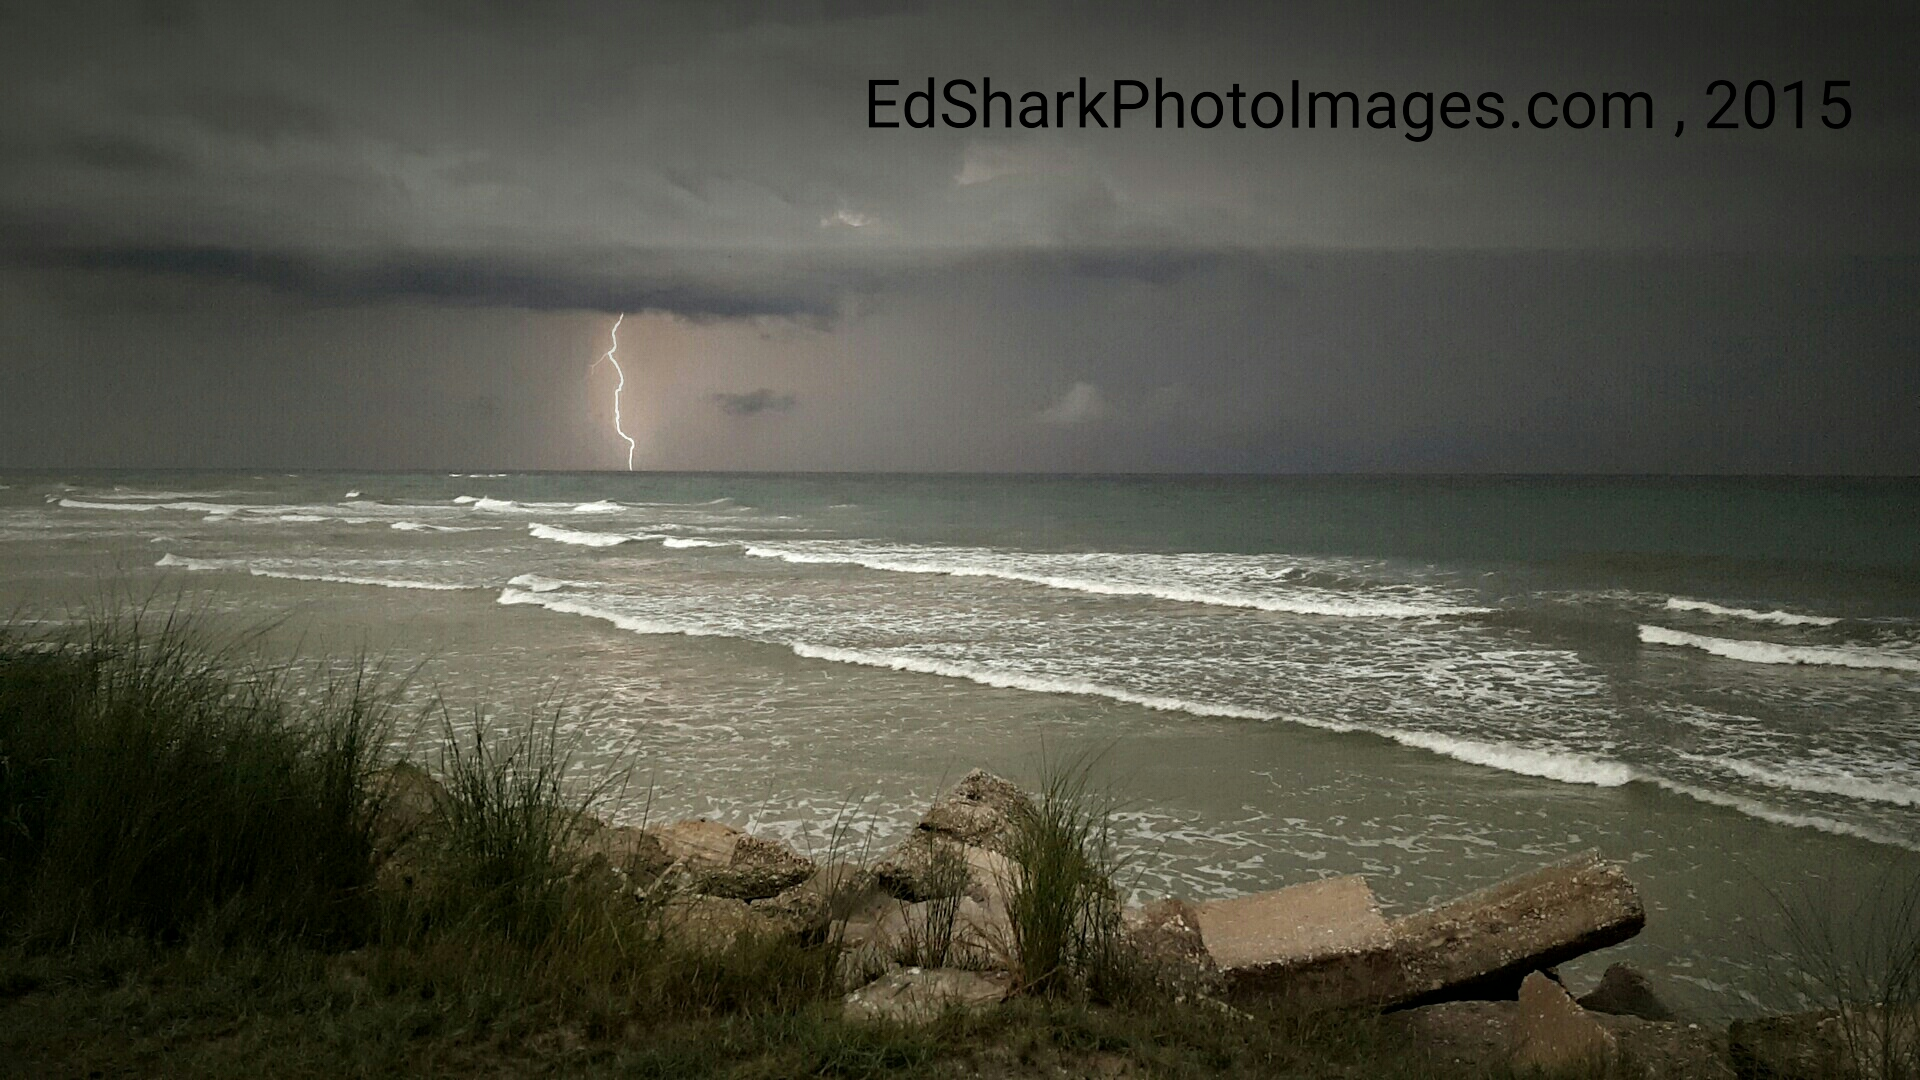 Lightning CW Matanzas 08.26.2015